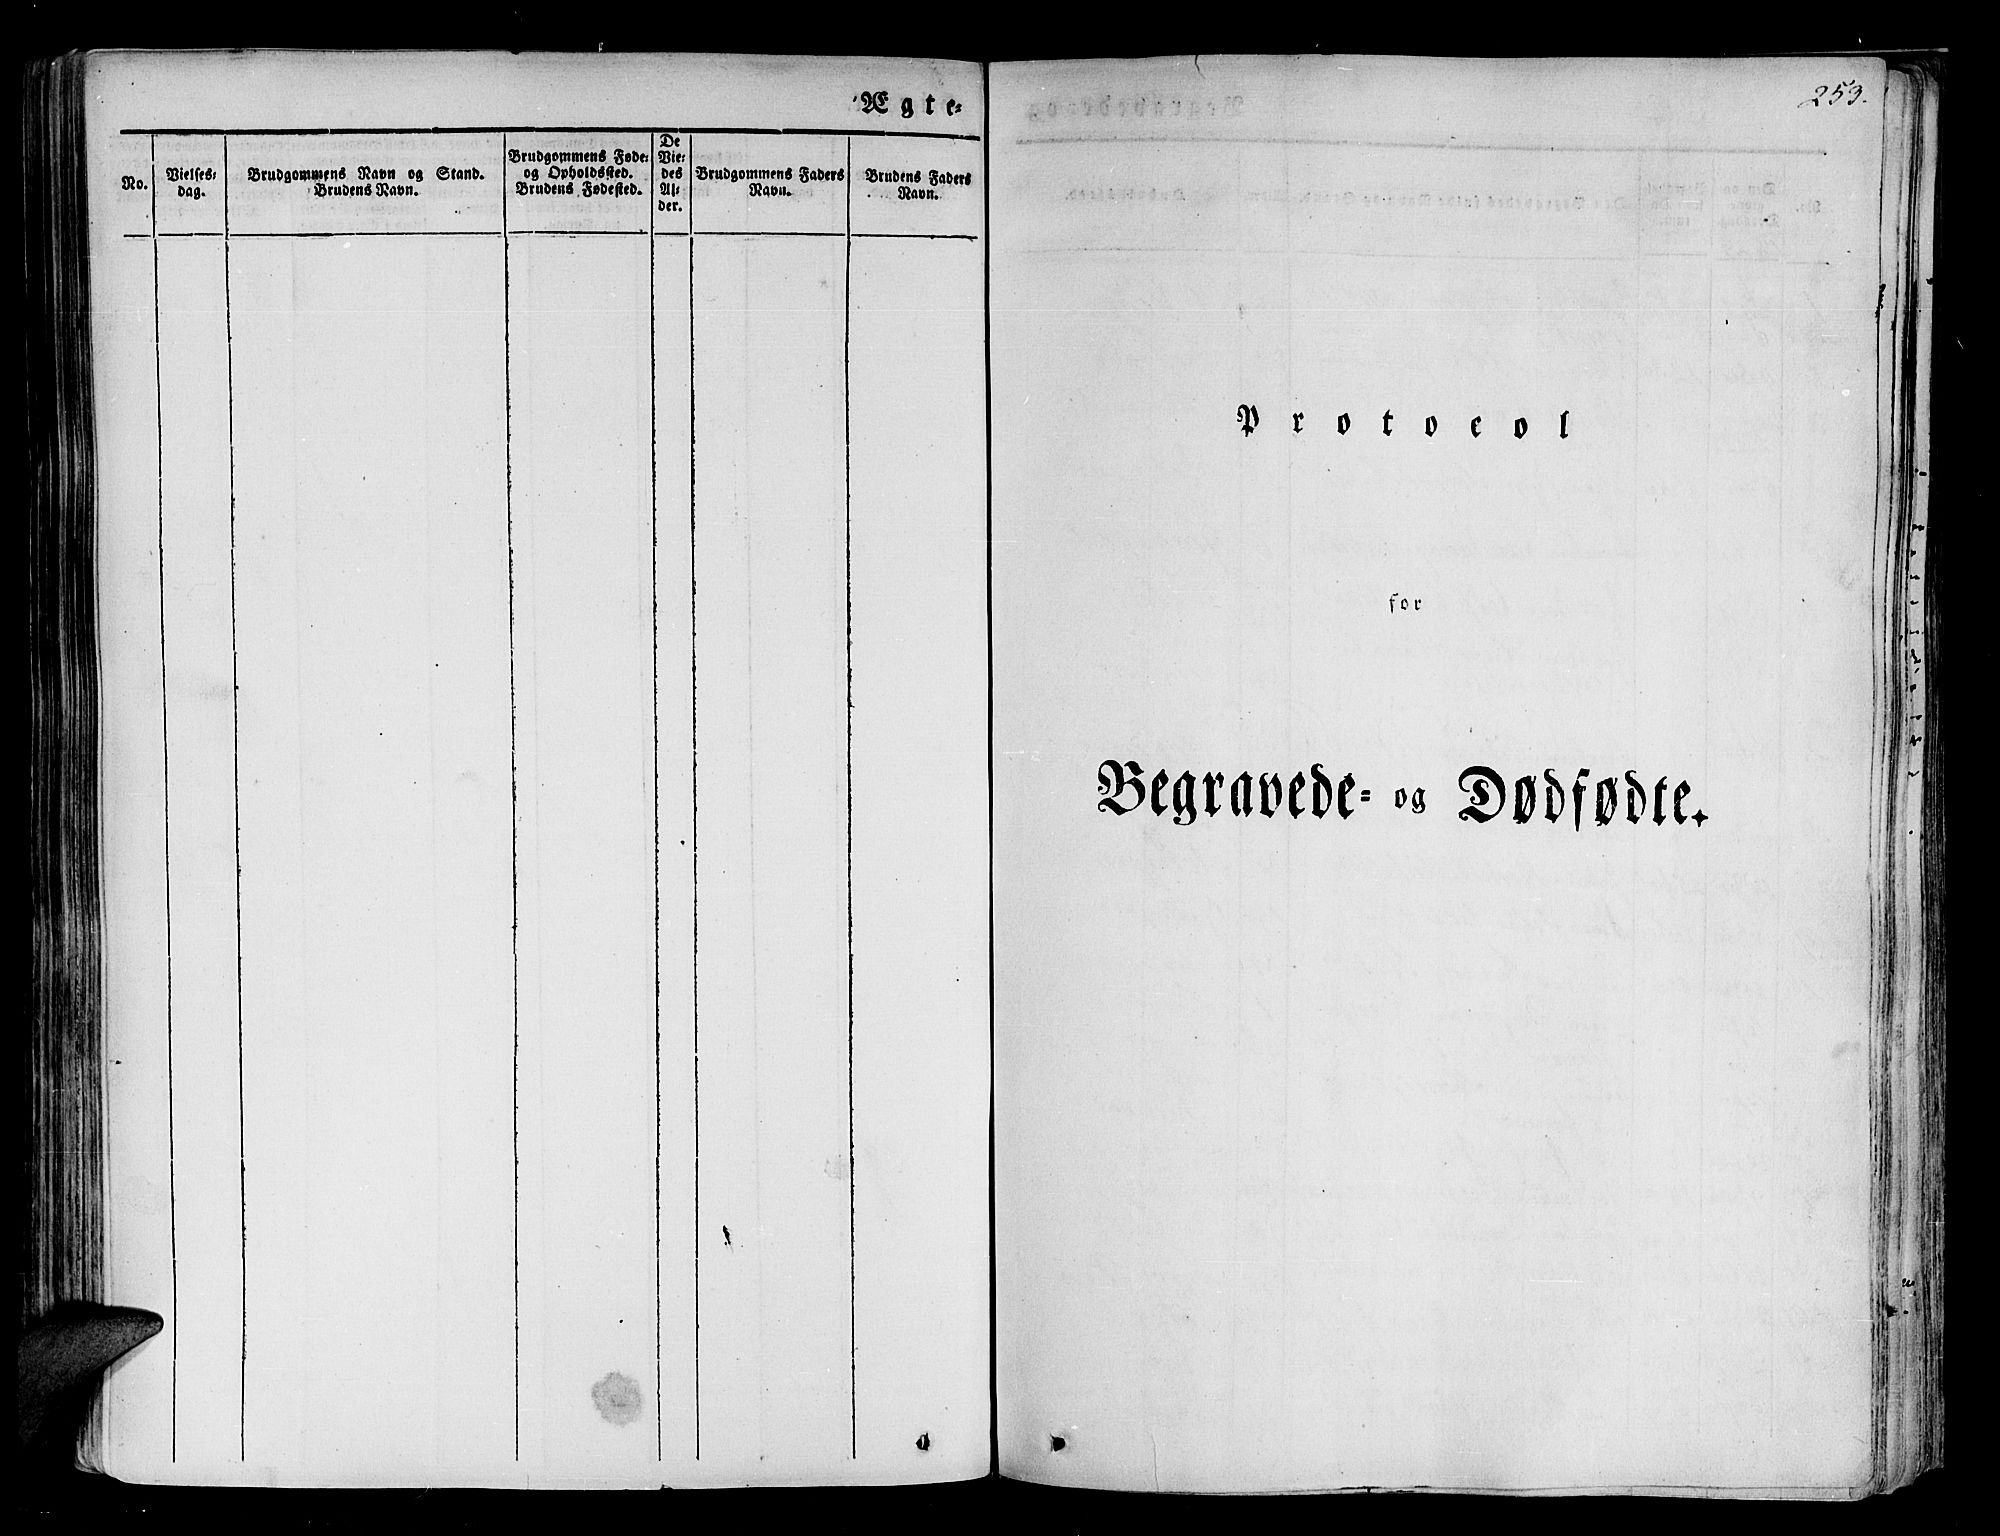 SATØ, Tranøy sokneprestkontor, I/Ia/Iaa/L0005kirke: Ministerialbok nr. 5, 1829-1844, s. 253